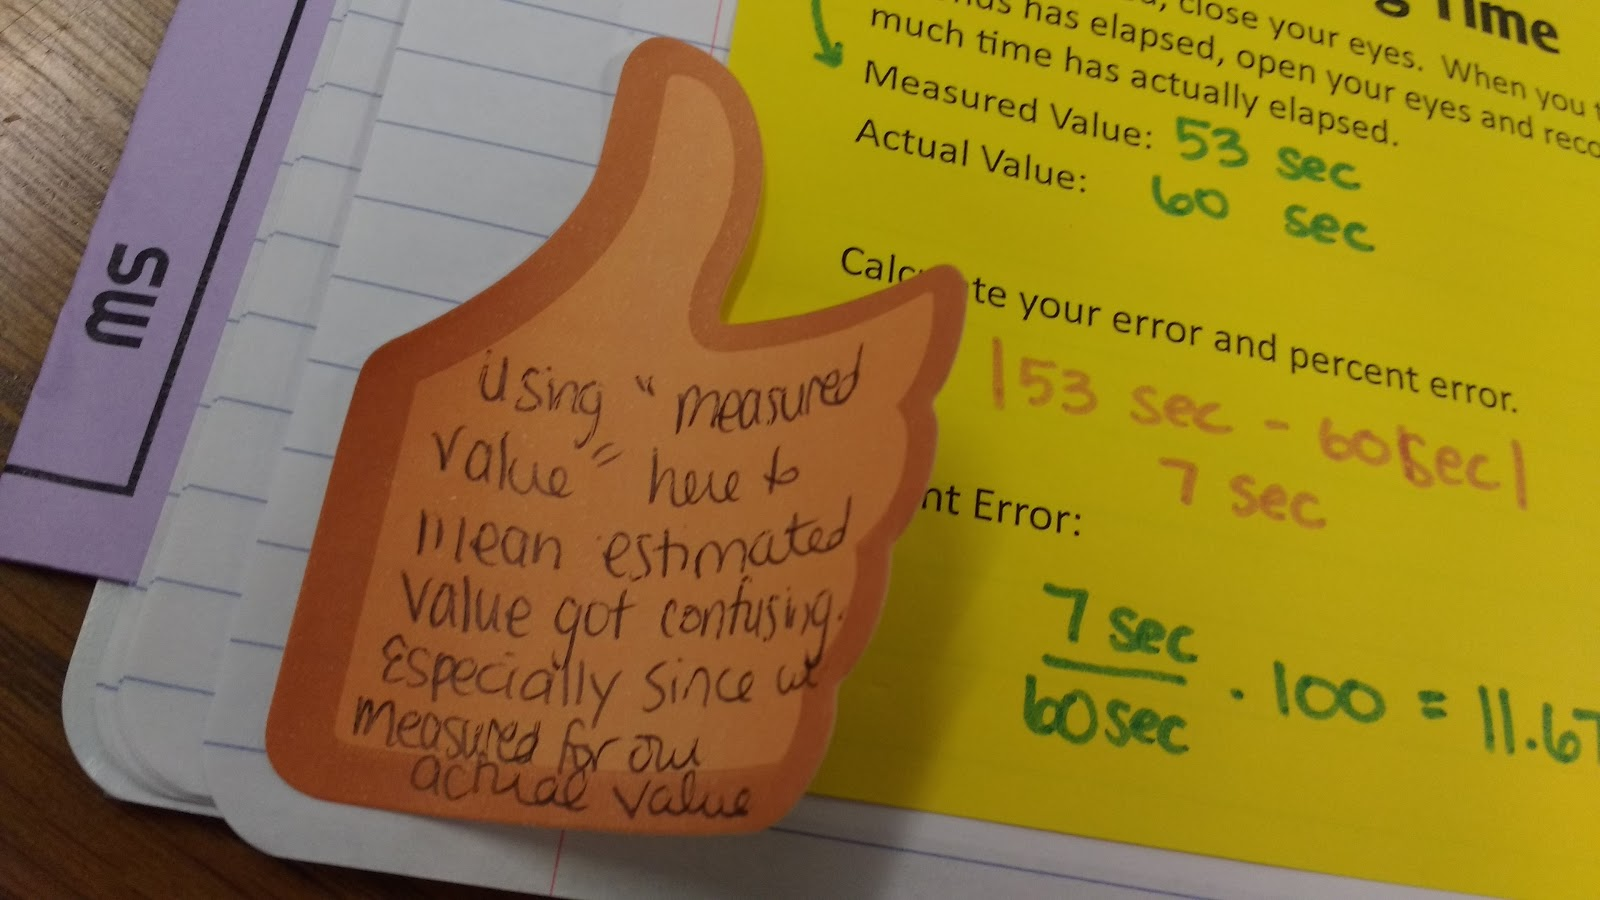 Math Love Mini Labs For Calculating Error And Percent Error